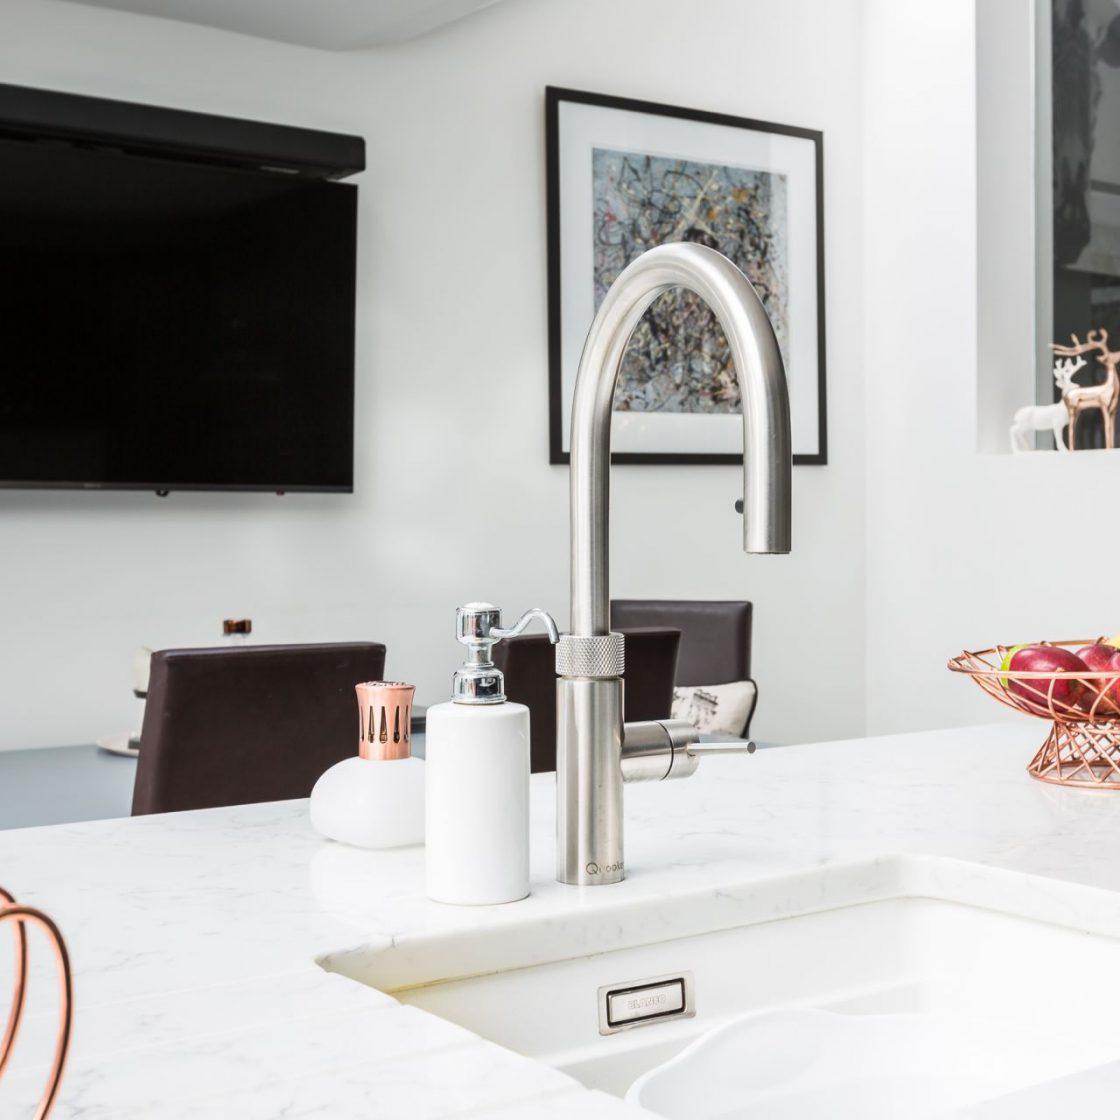 Plus Rooms Kitchen Extension, LandellsRoad, SE22-10